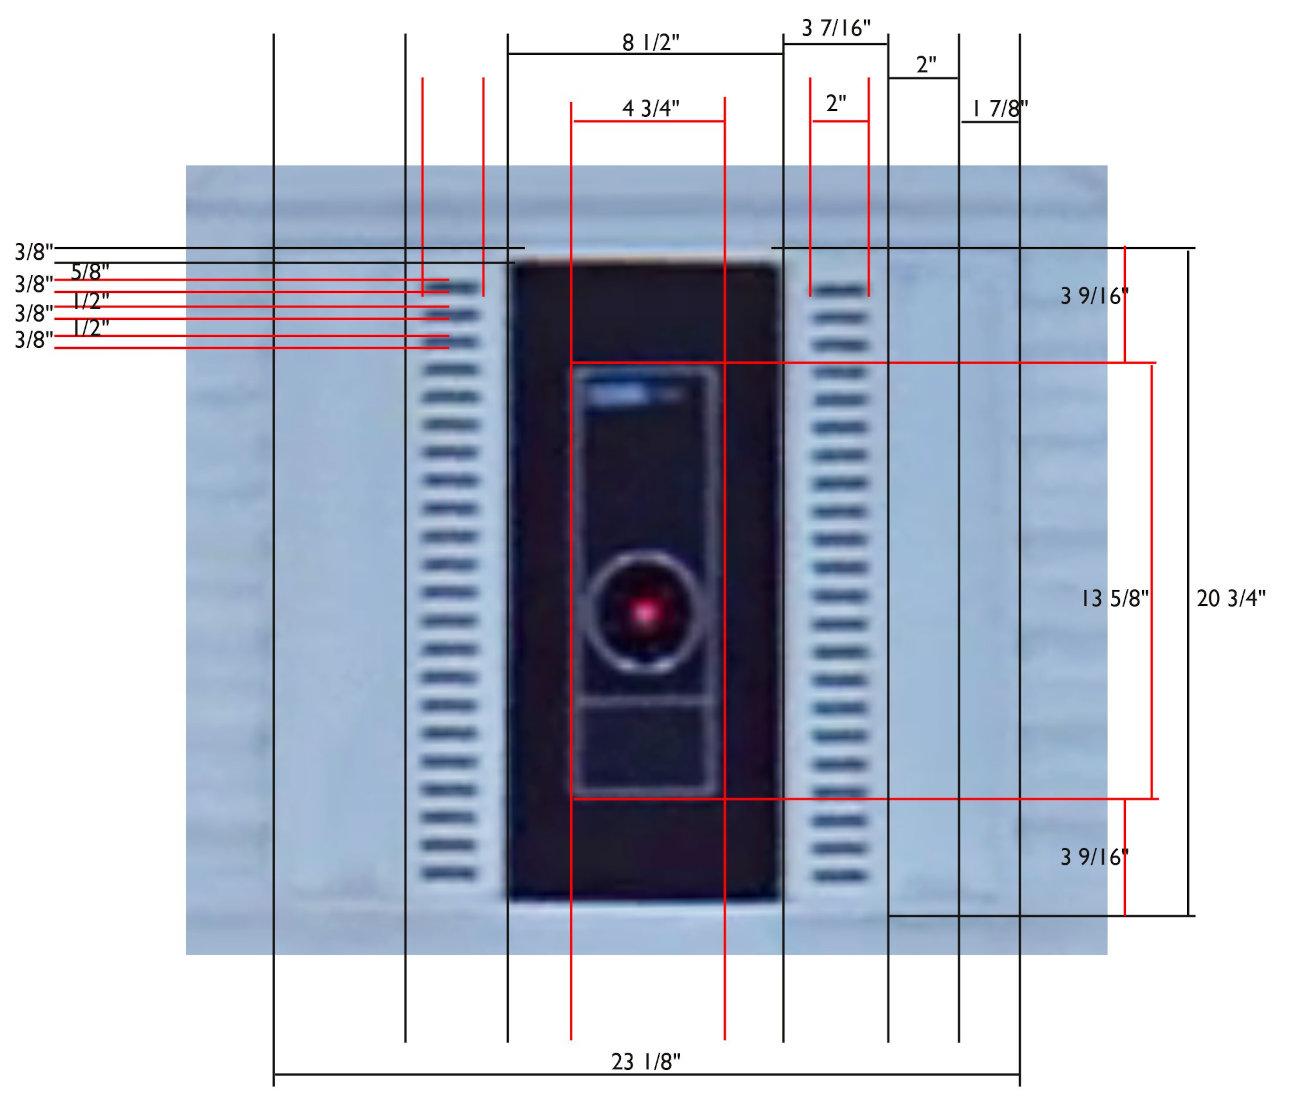 HAL-hallway-dimensions.jpg